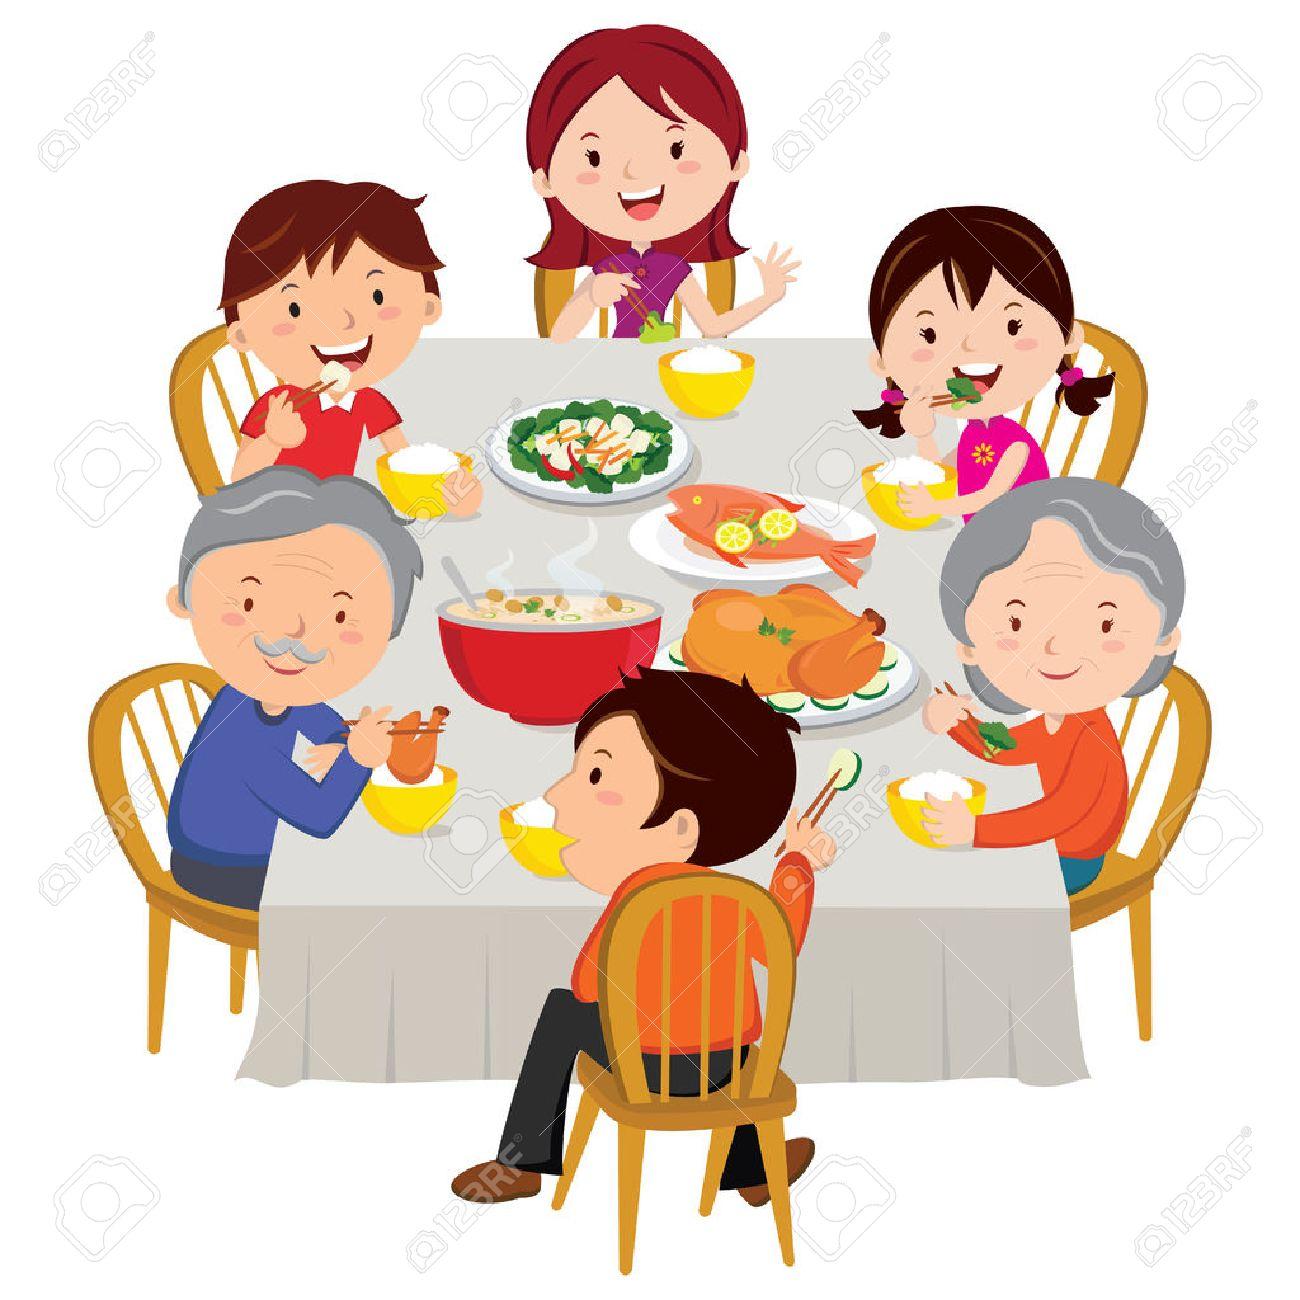 Family having Chinese New Year dinner - 66571788